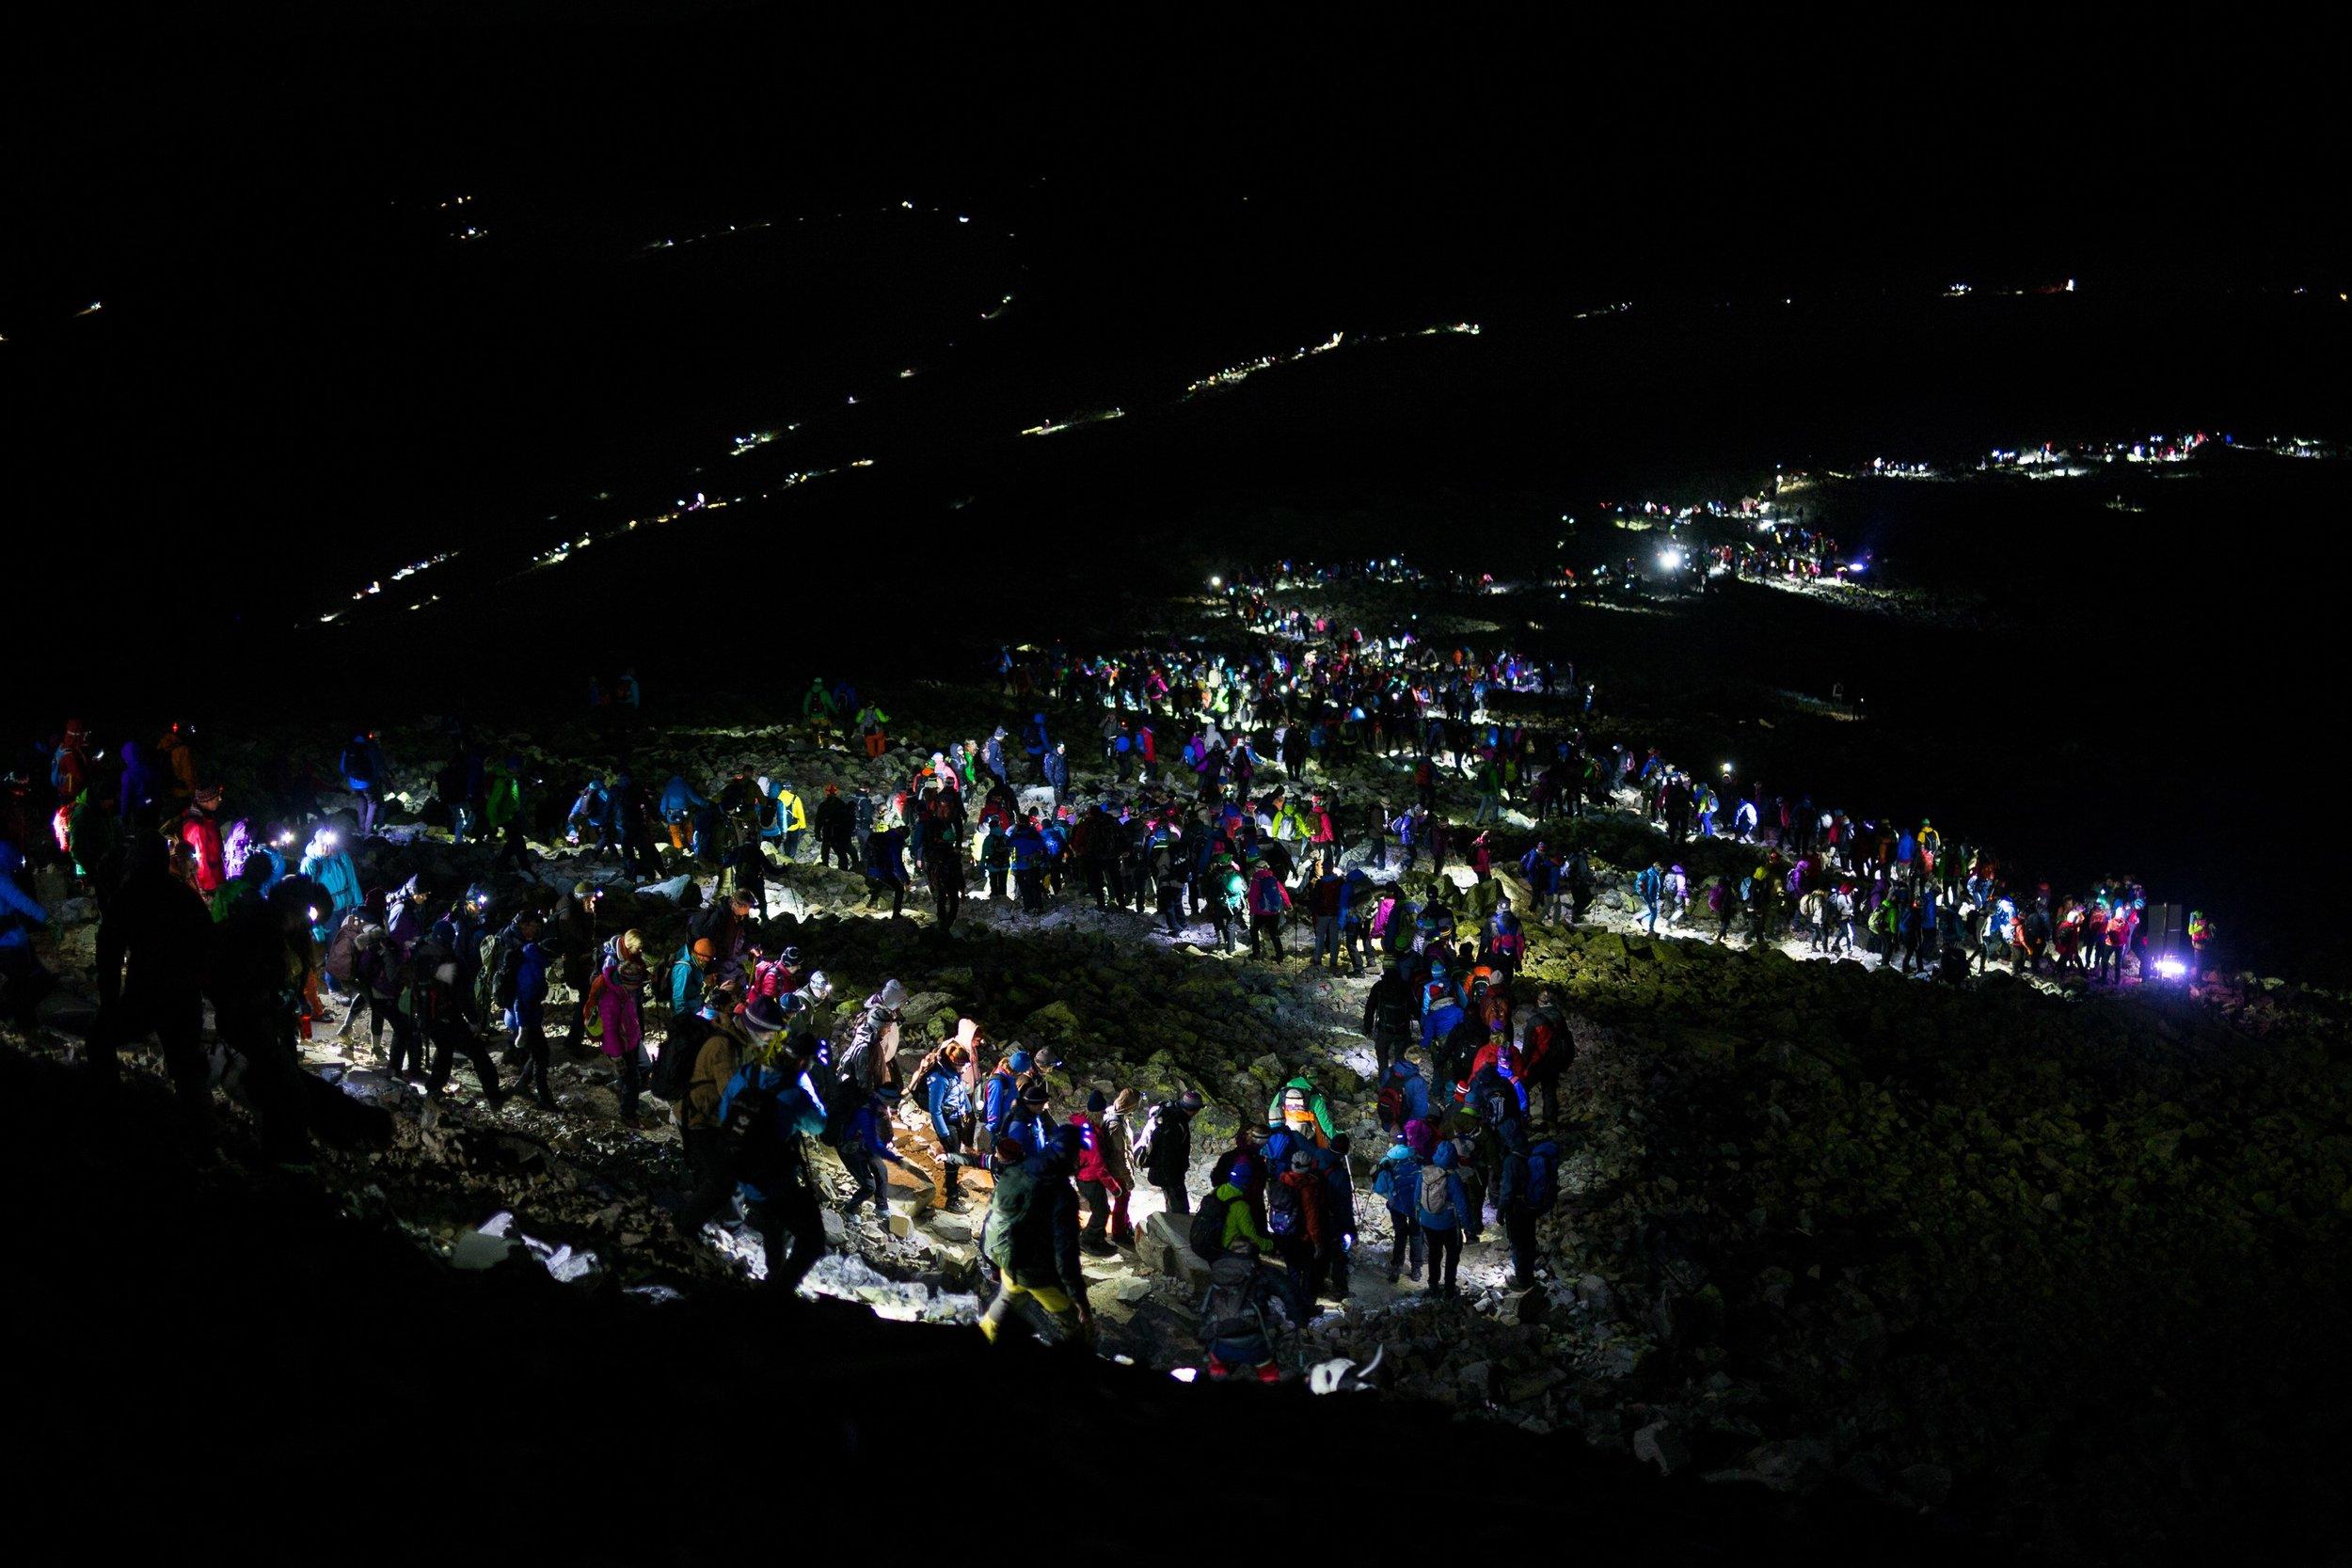 Foto: ALEKSANDER MYKLEBUST / NORAD